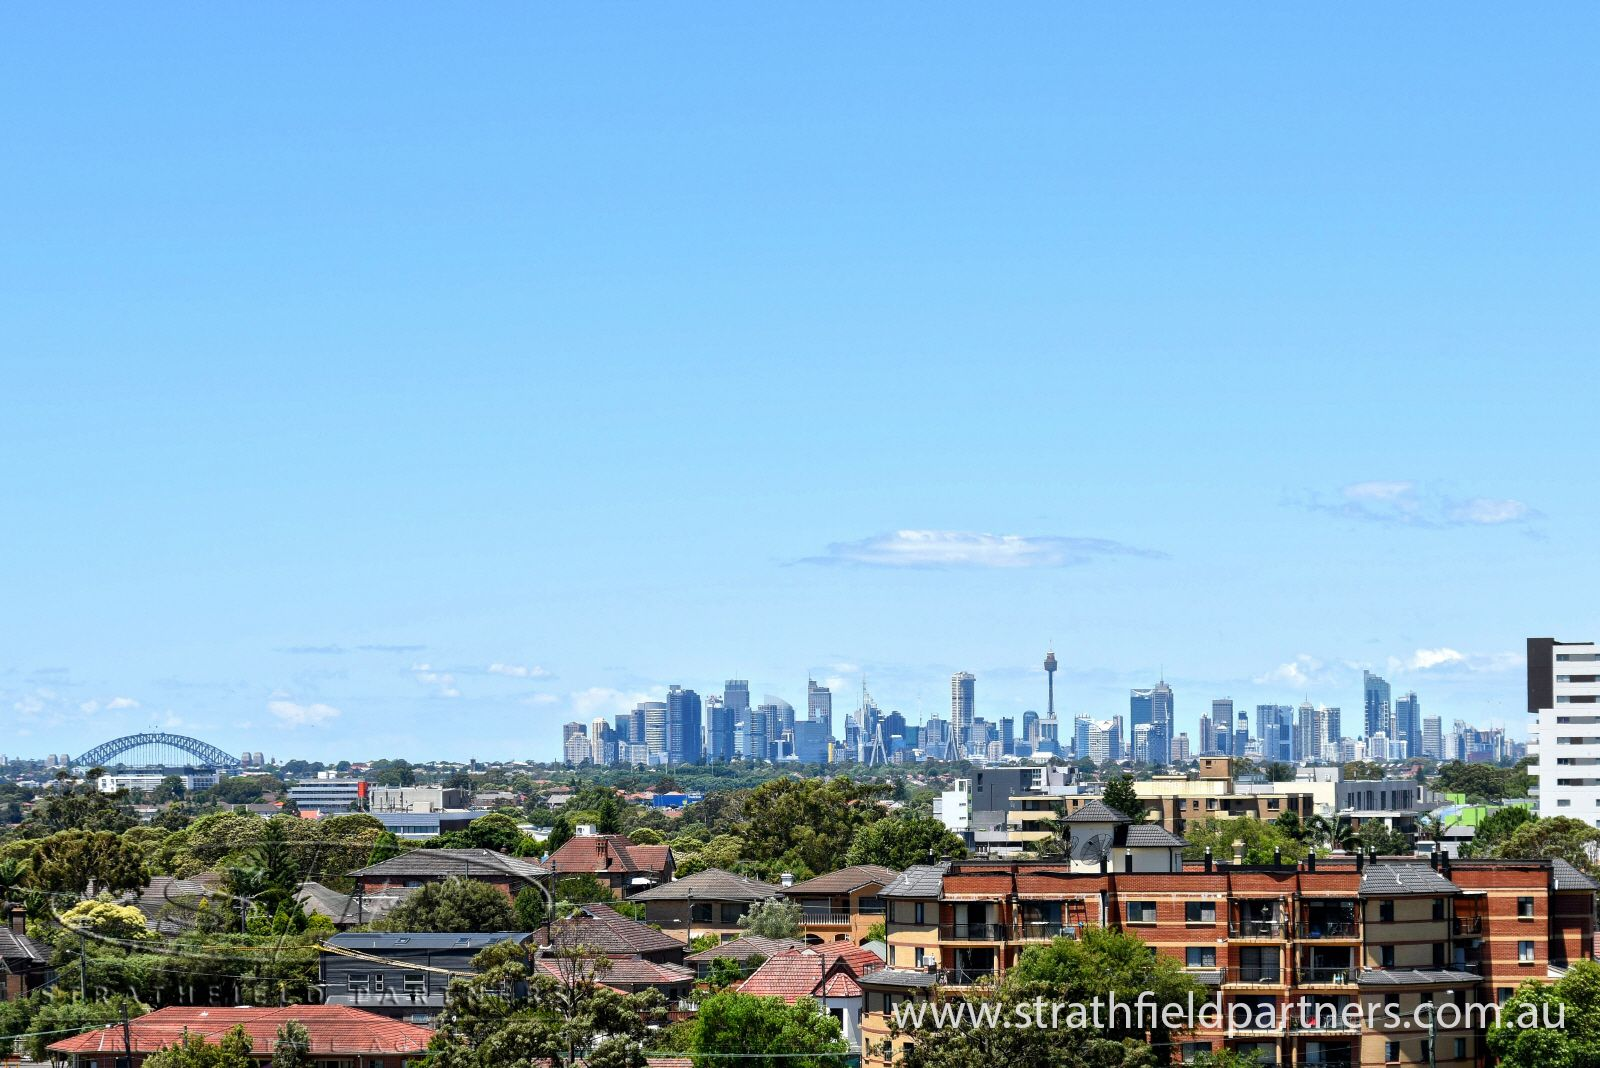 203/29 Morwick Street, Strathfield NSW 2135, Image 0